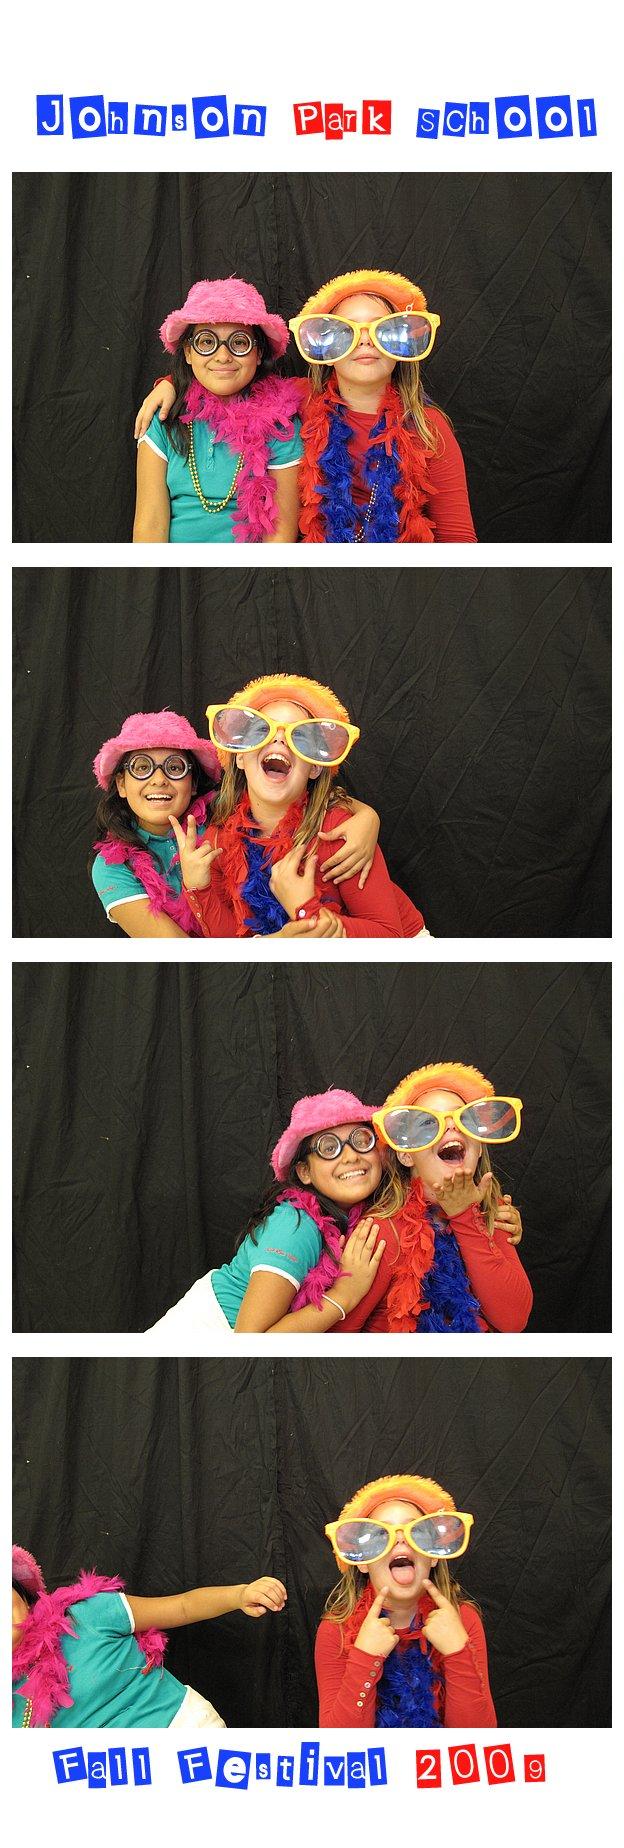 Johnson Park School Fall Festival